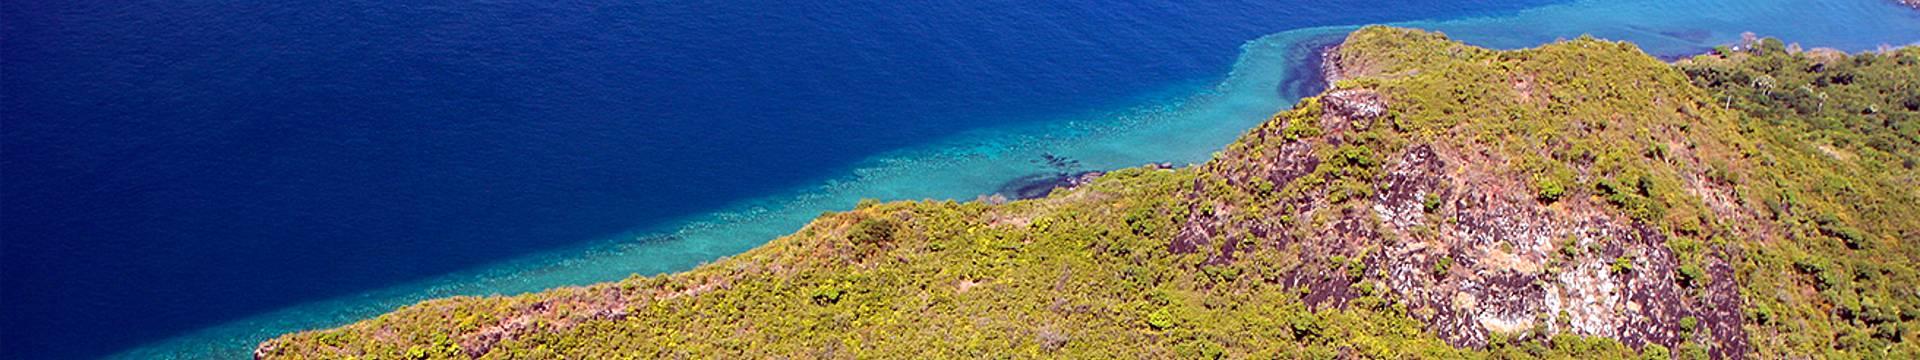 Voyage à Mayotte